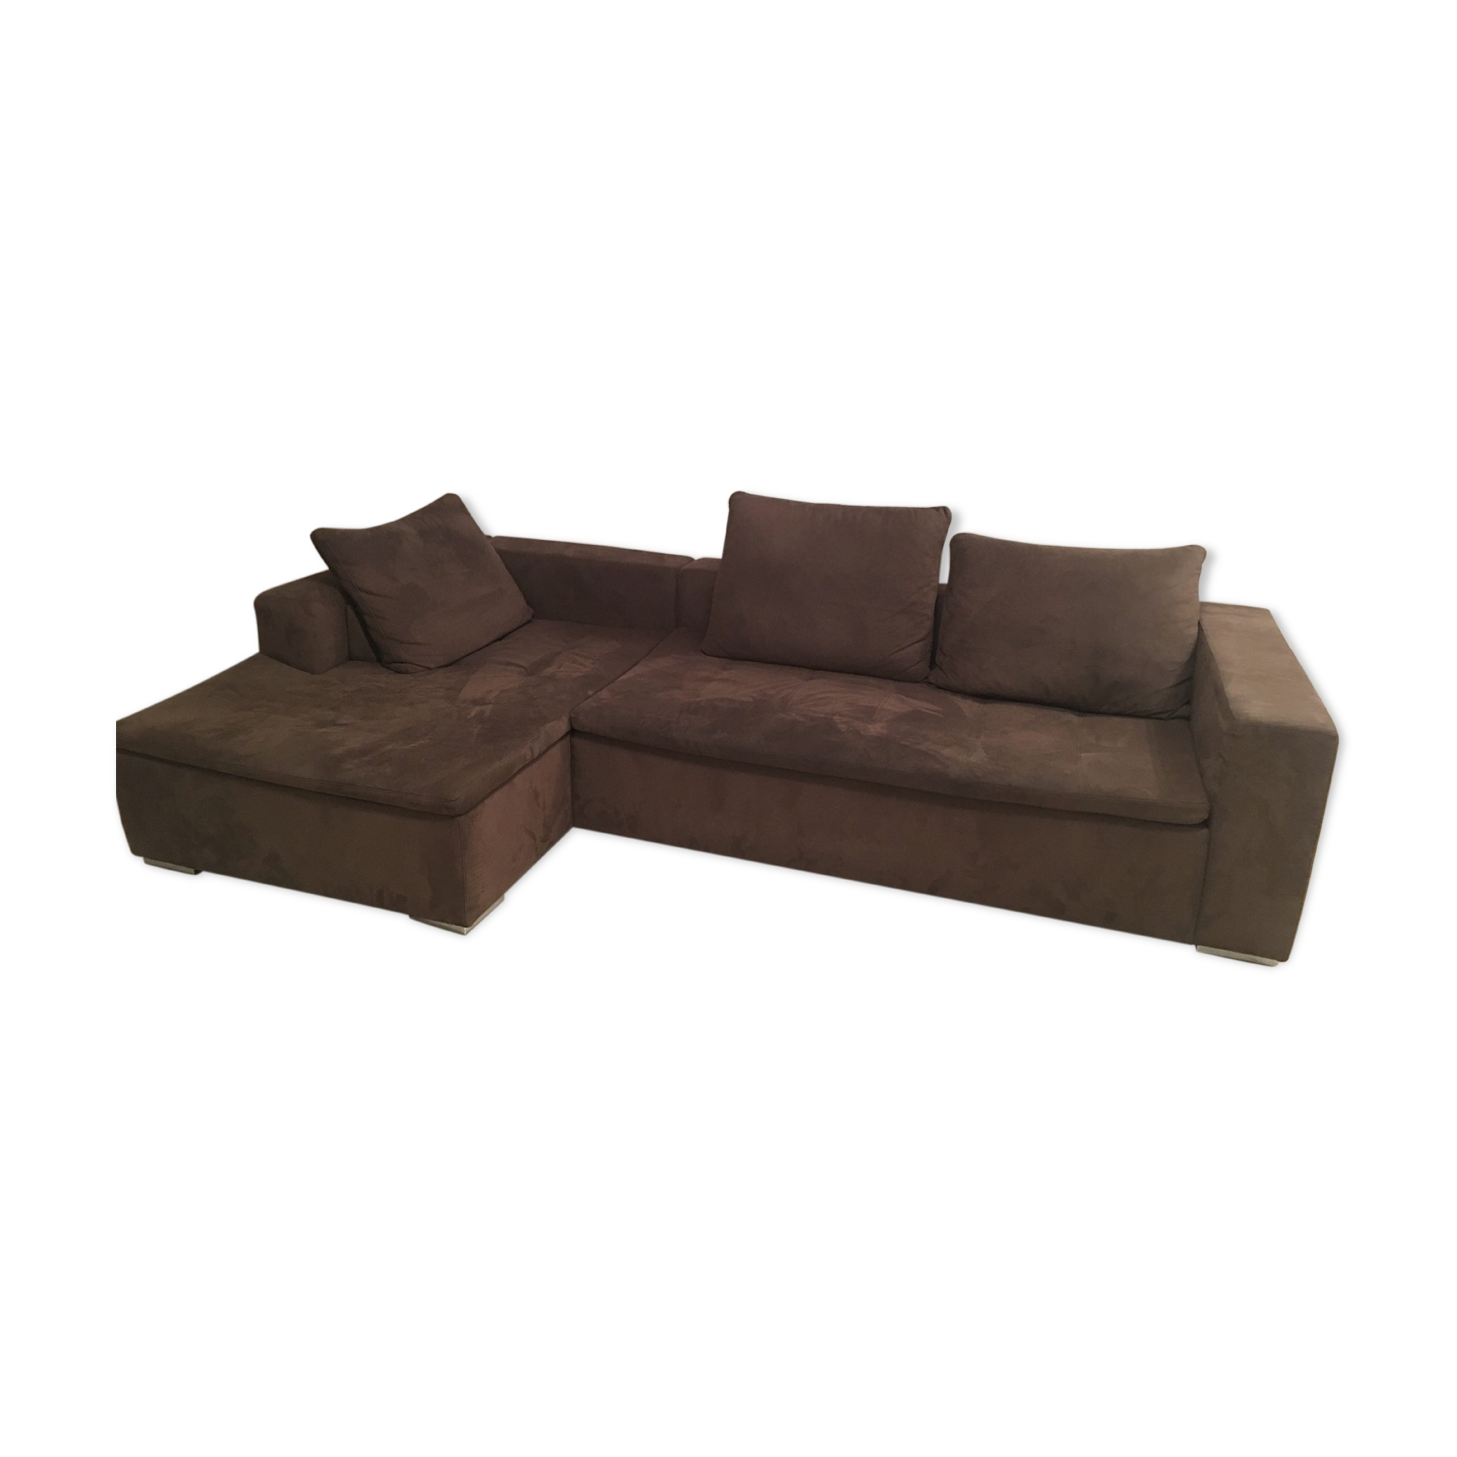 Canapé d'angle Bo Concept, modèle Mezzo